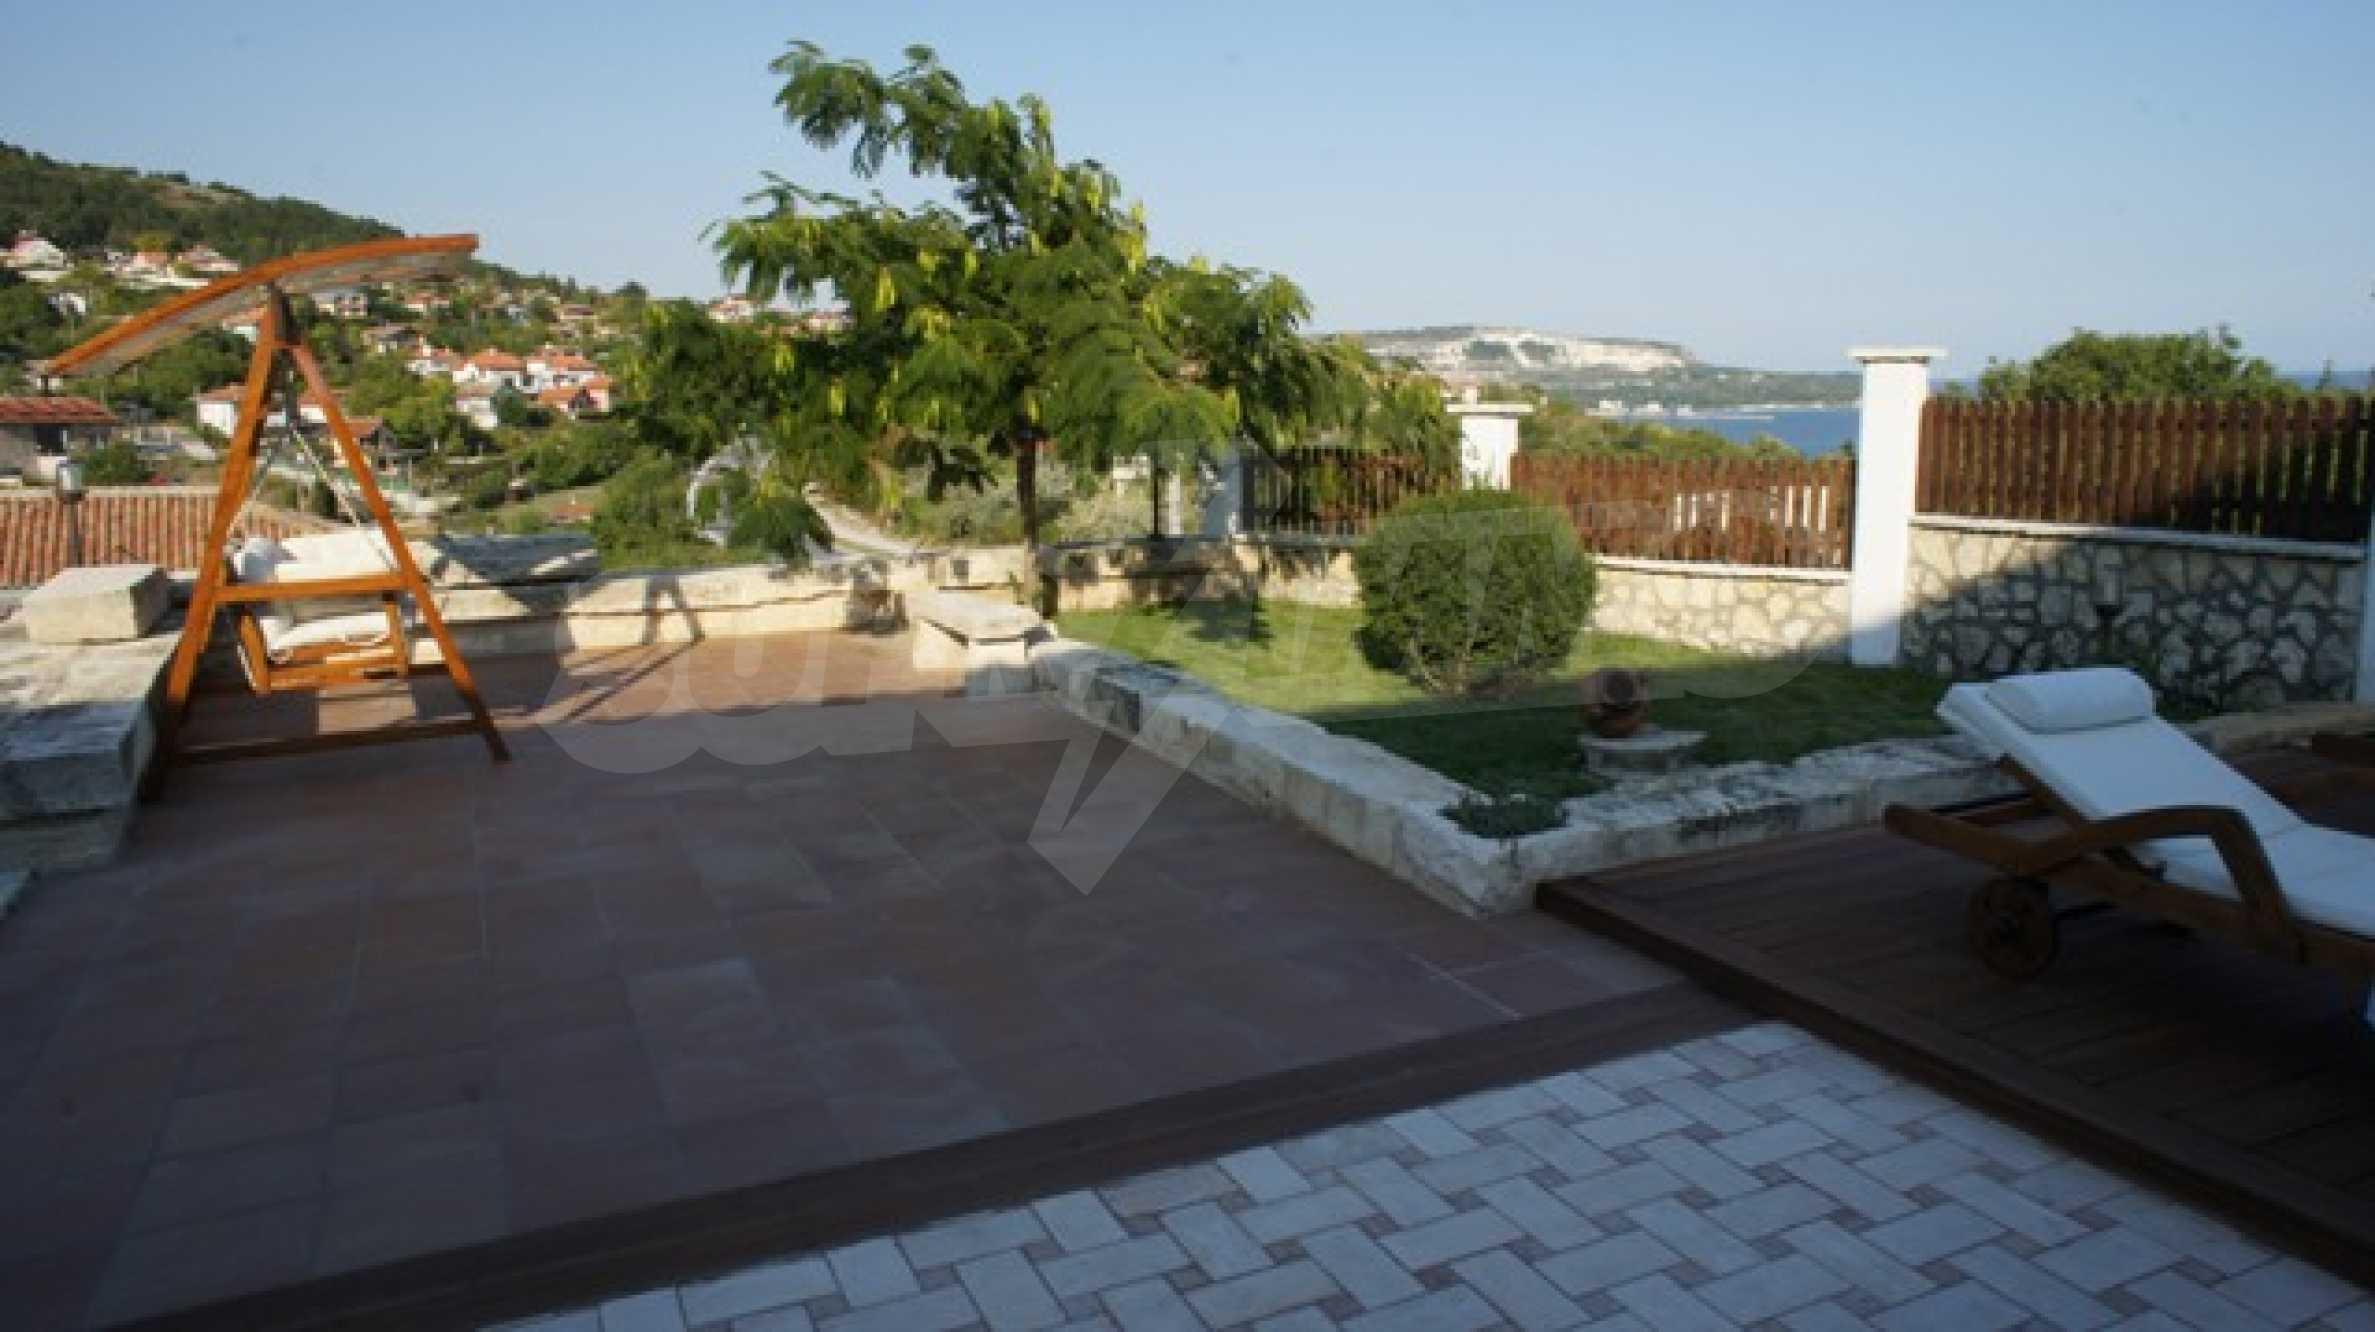 The Mediterranean style - a sense of luxury 19